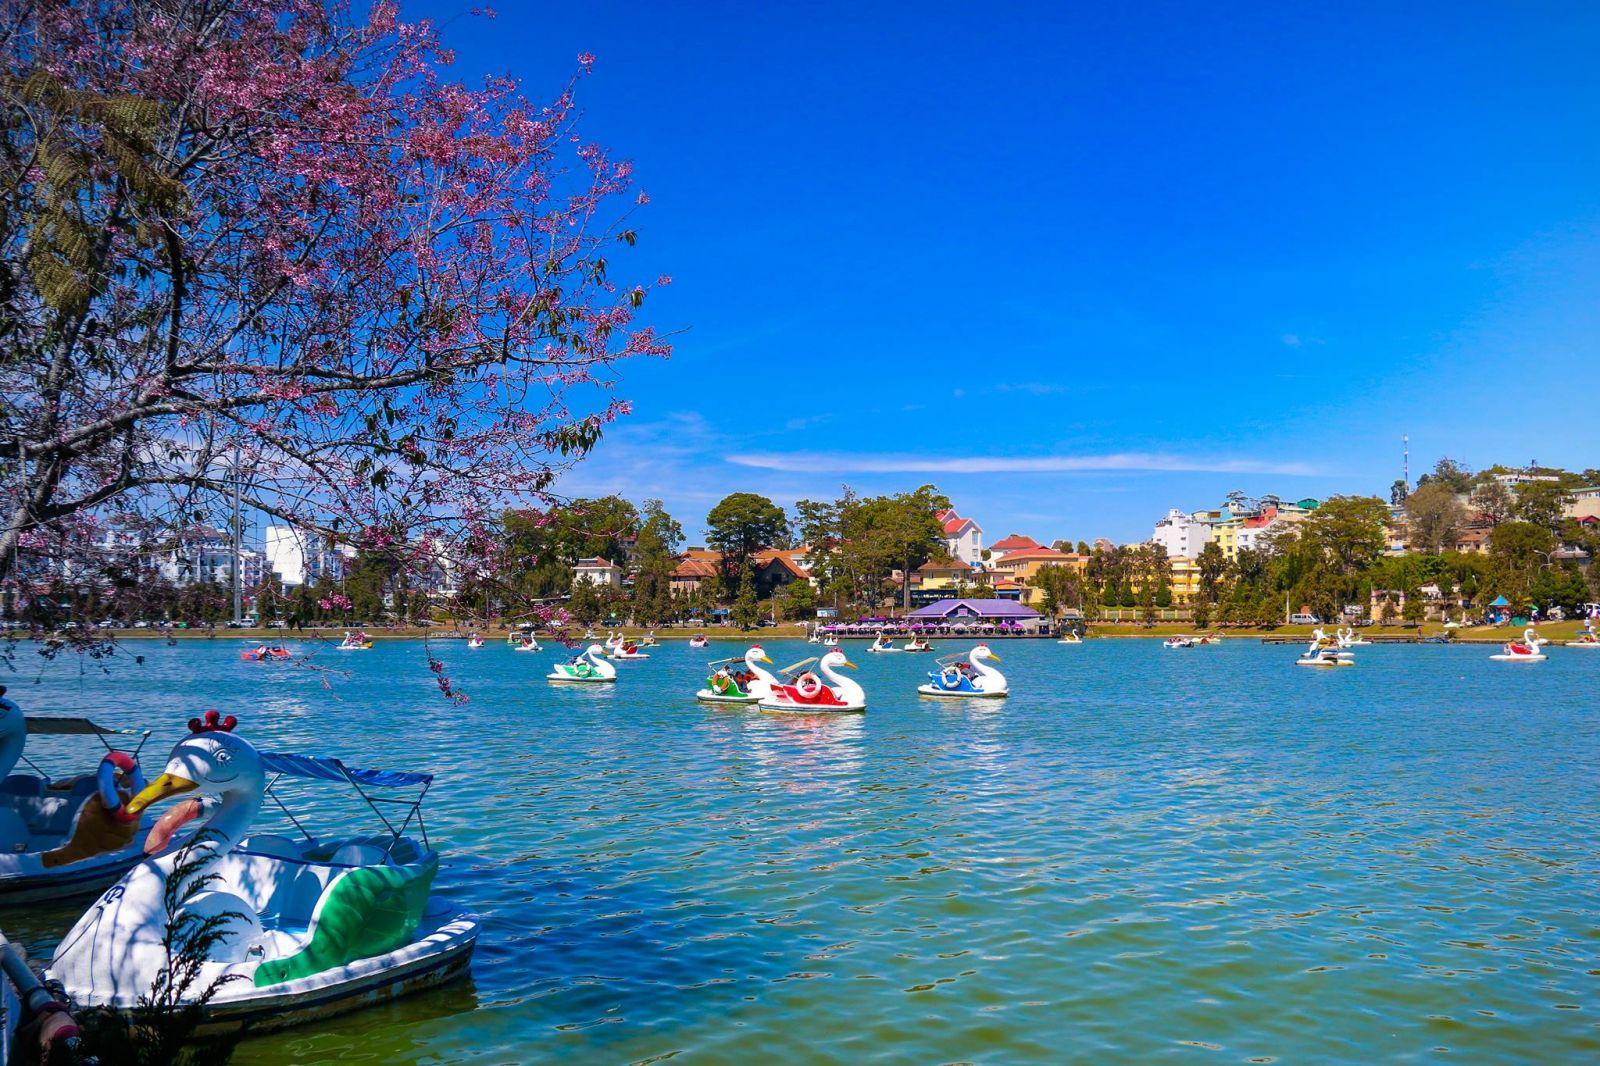 swan-pedal-boats-are-popular-in-xuan-huong-lake-saigon-riders